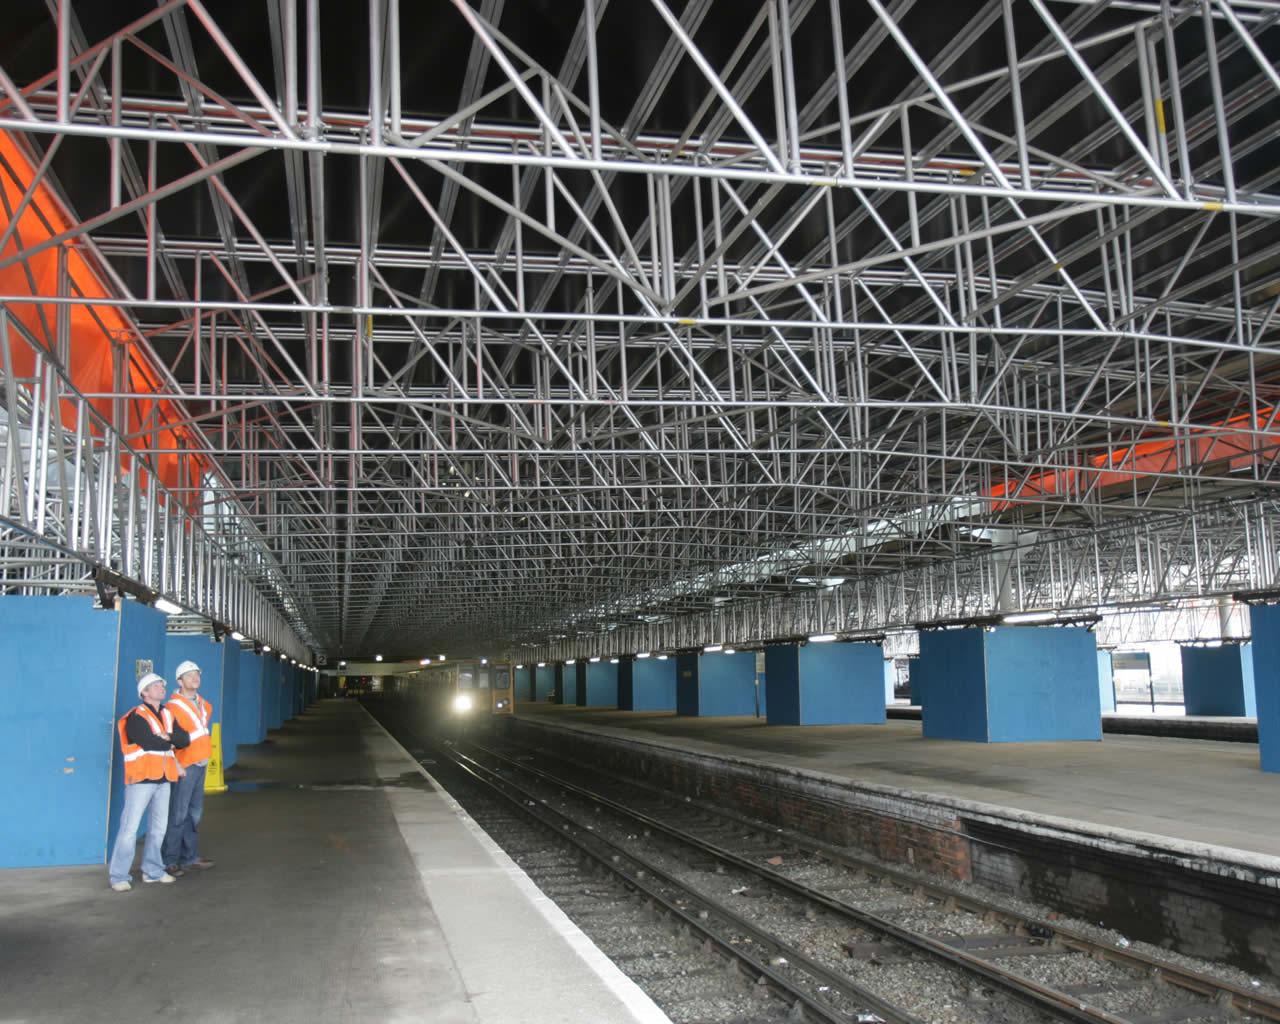 Southport Station